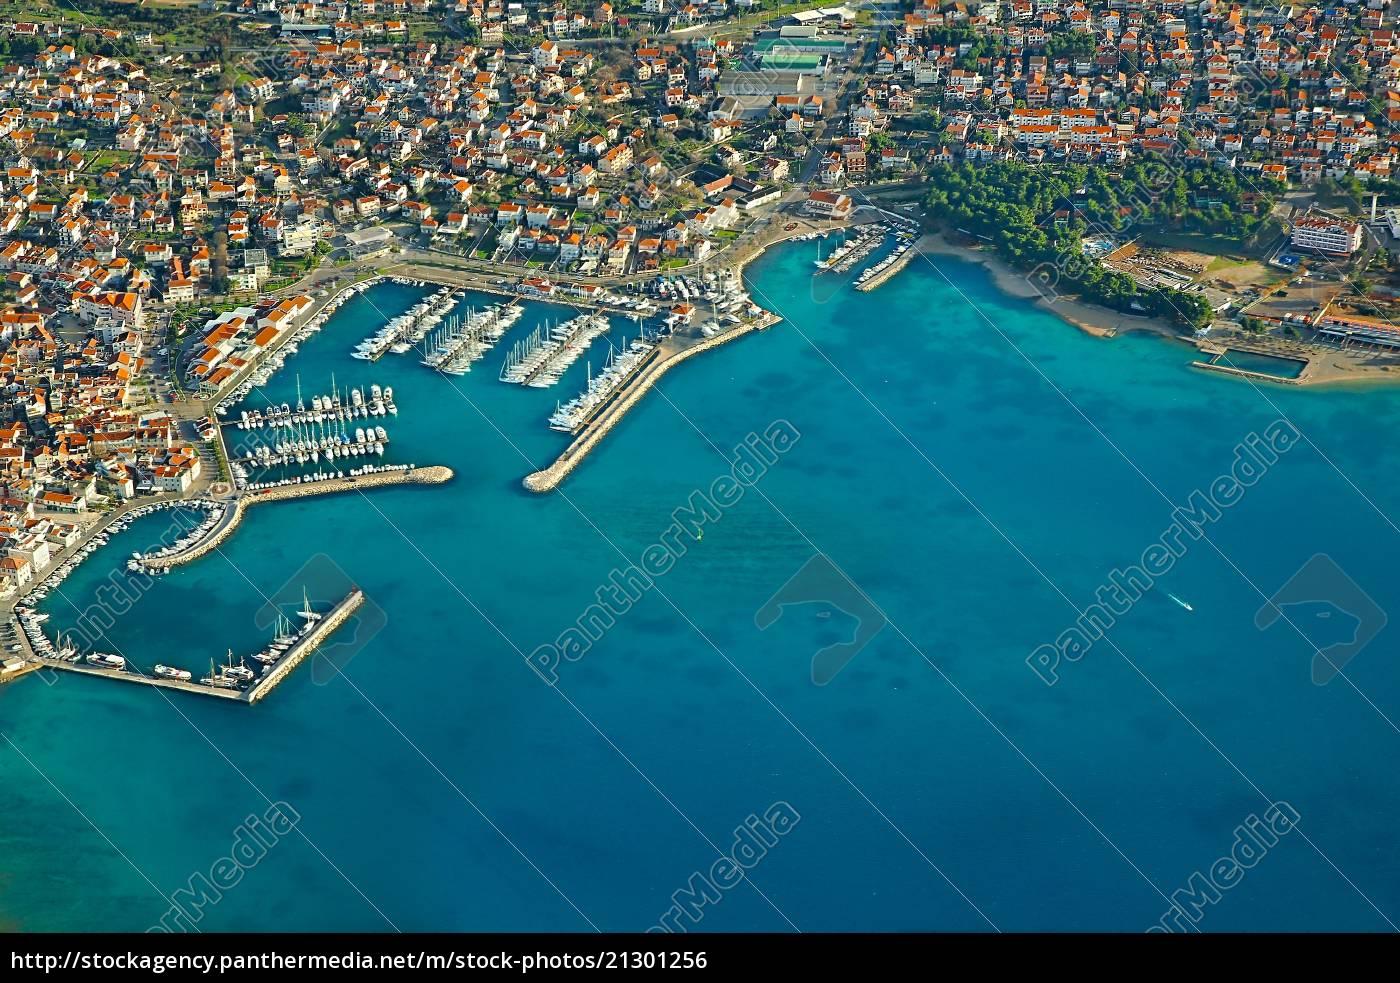 croatian, coastal, town - 21301256